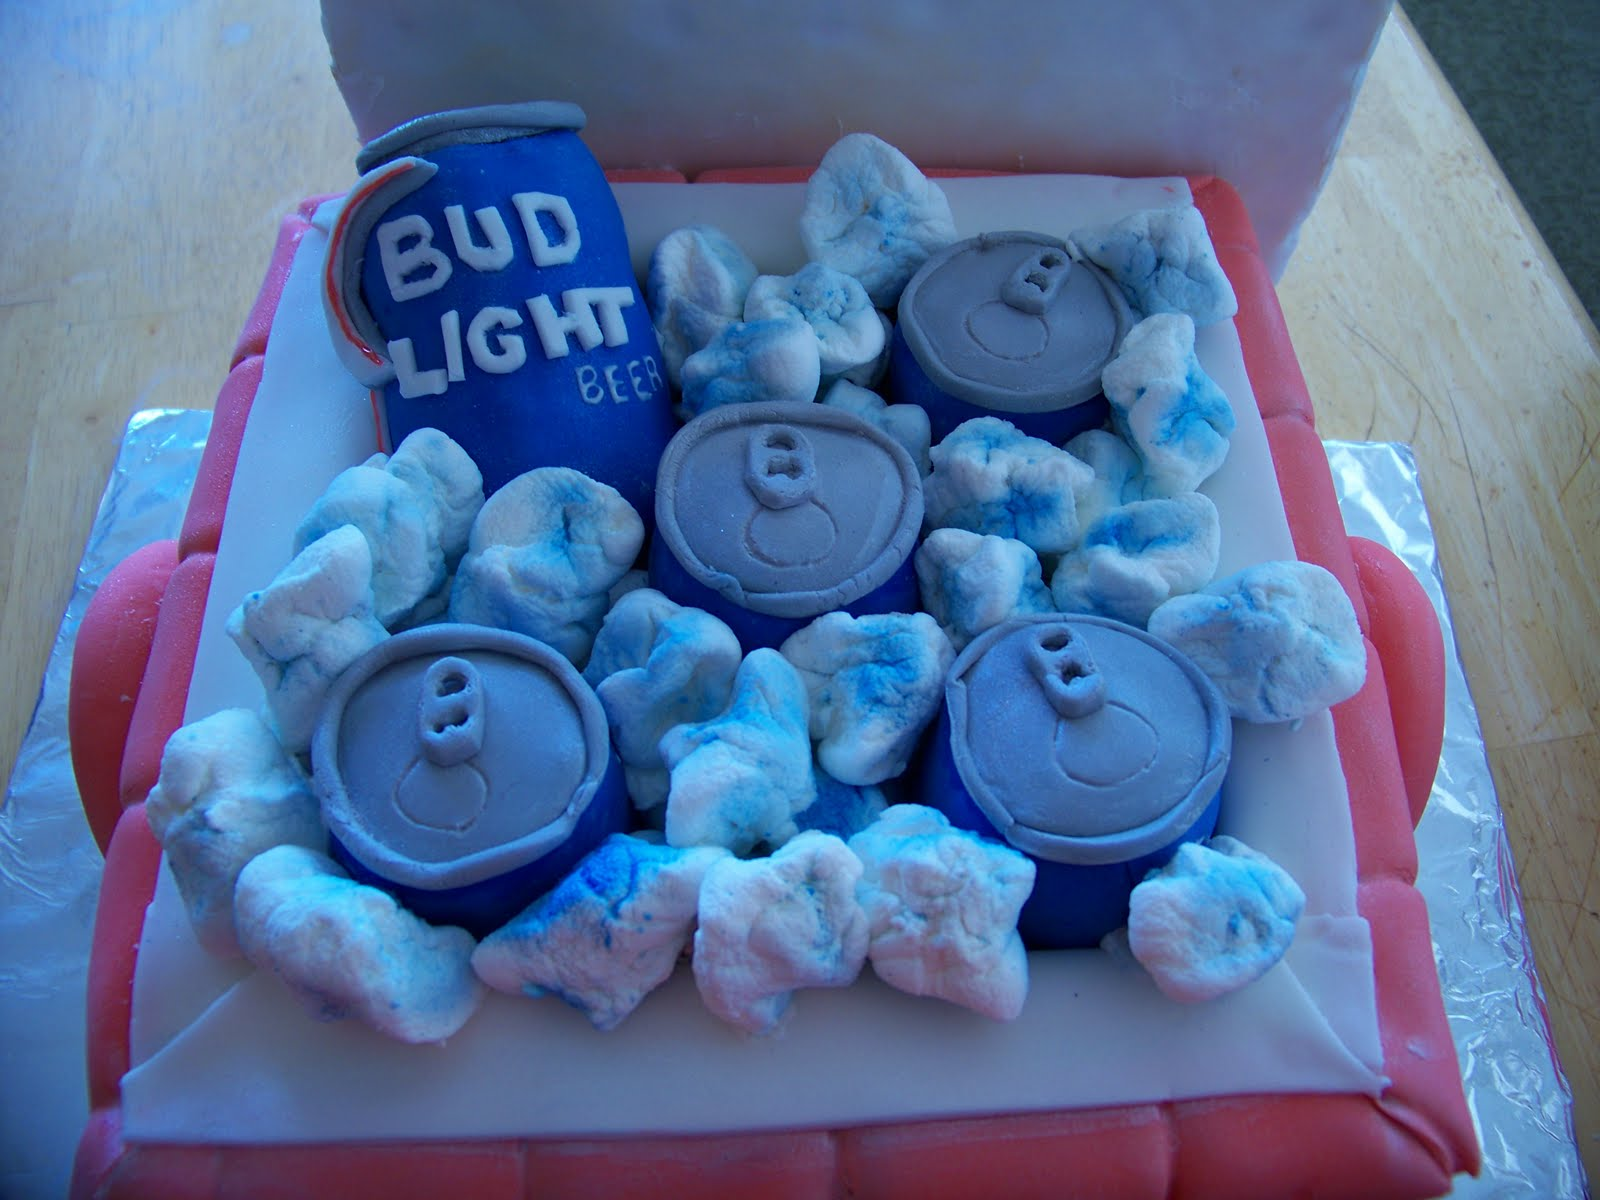 Bud Light Cake Image 1600x1200